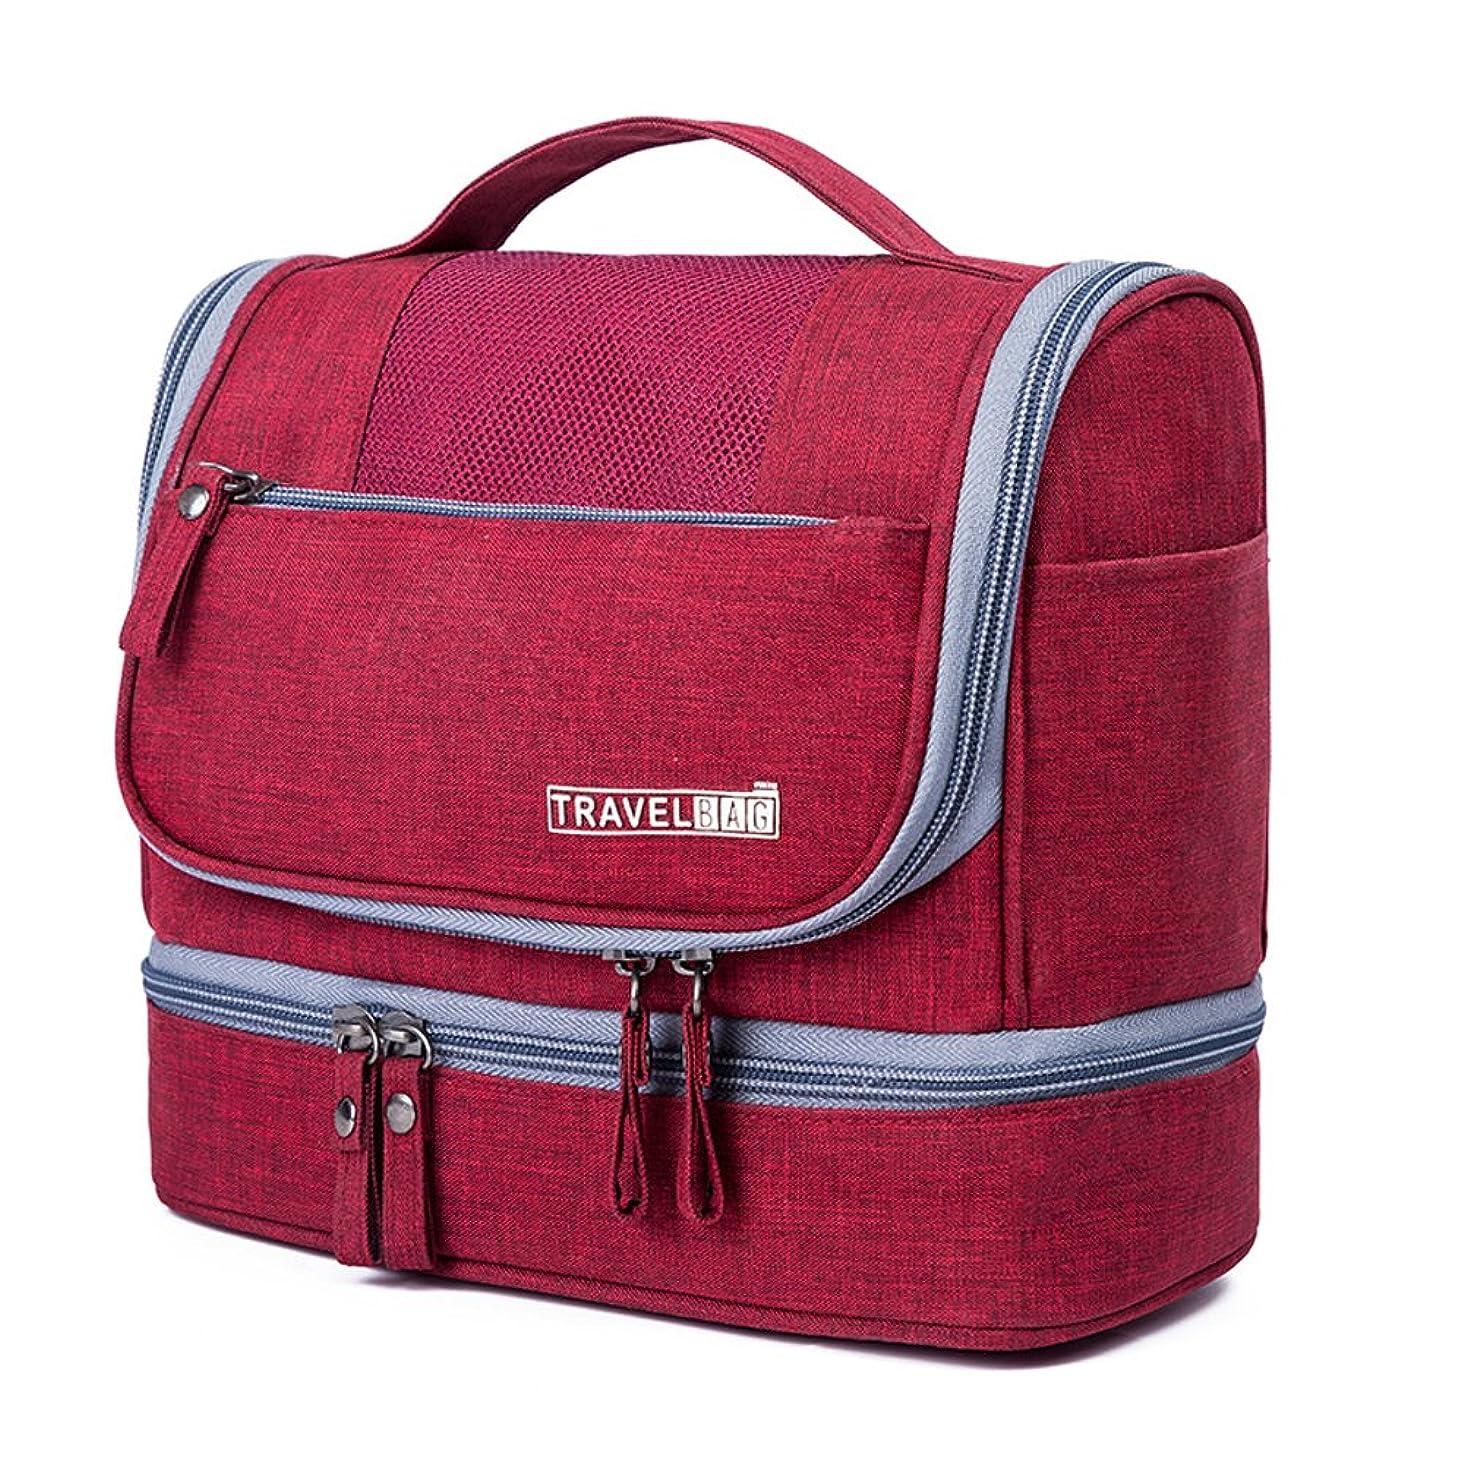 Hanging Travel Toiletry Bag/Toiletry kit/Cosmetics Bag Outdoor Travel Equipment Organizer Waterproof Dry Wet Separation (Claret)